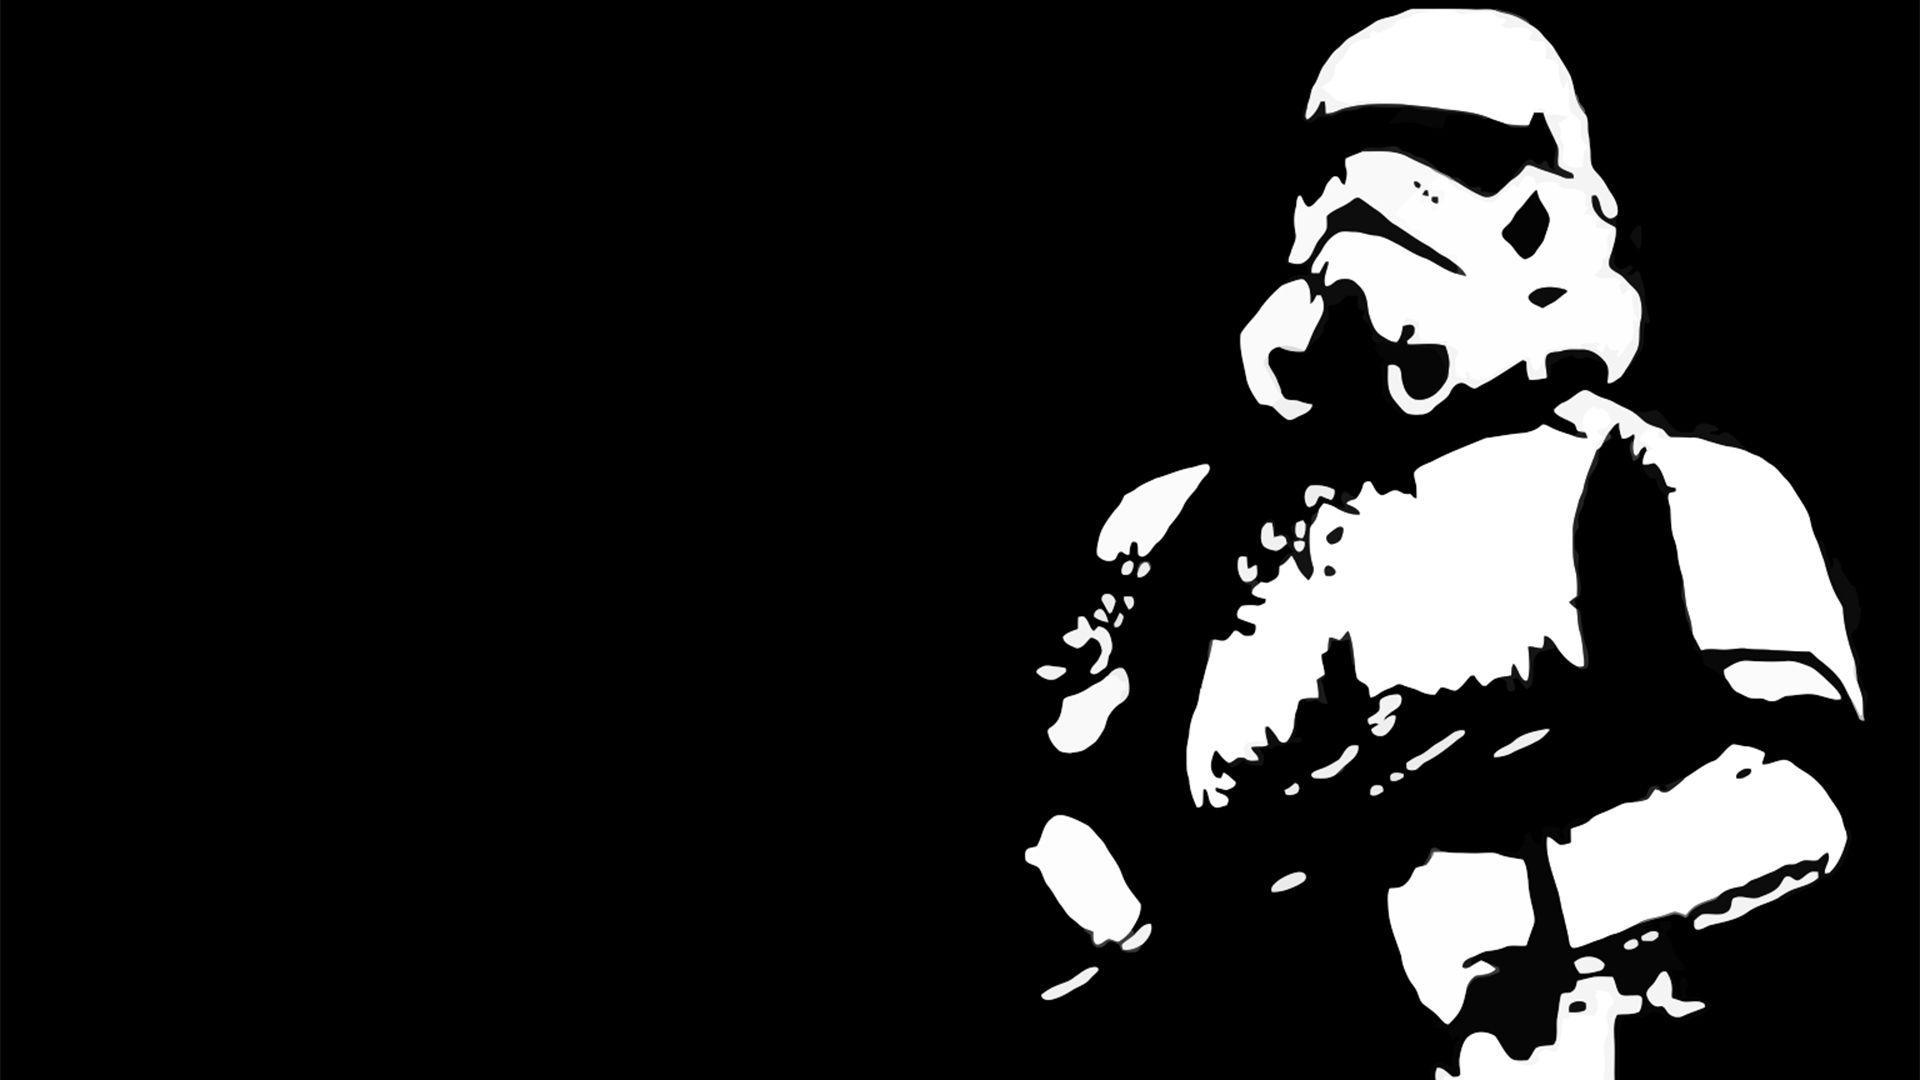 Star wars stormtrooper wallpapers wallpaper cave - Stormtrooper suit wallpaper ...